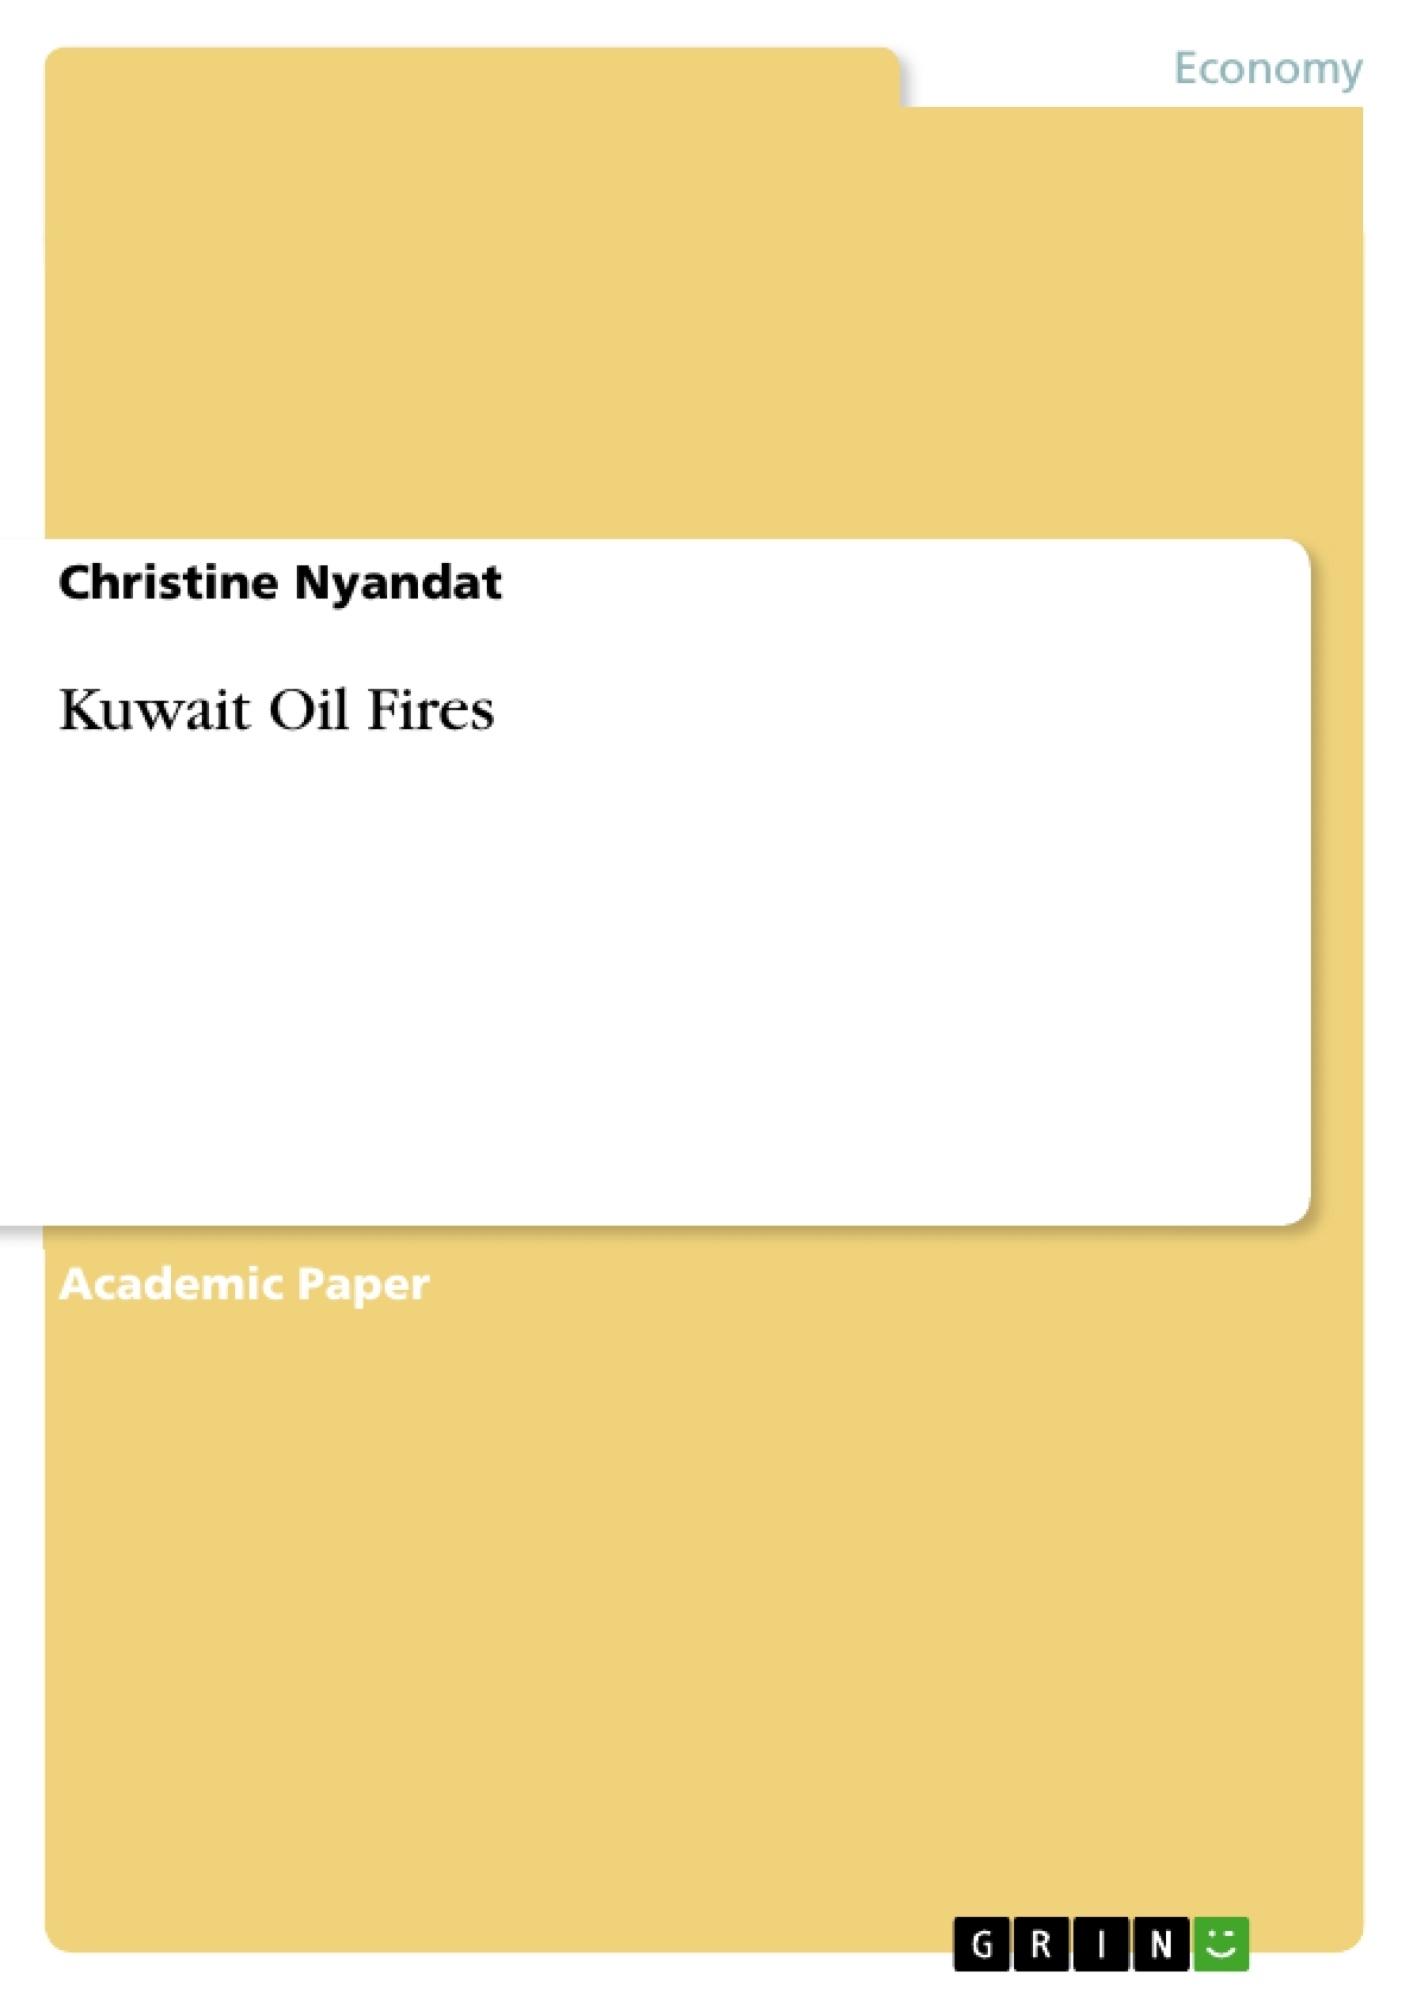 Title: Kuwait Oil Fires